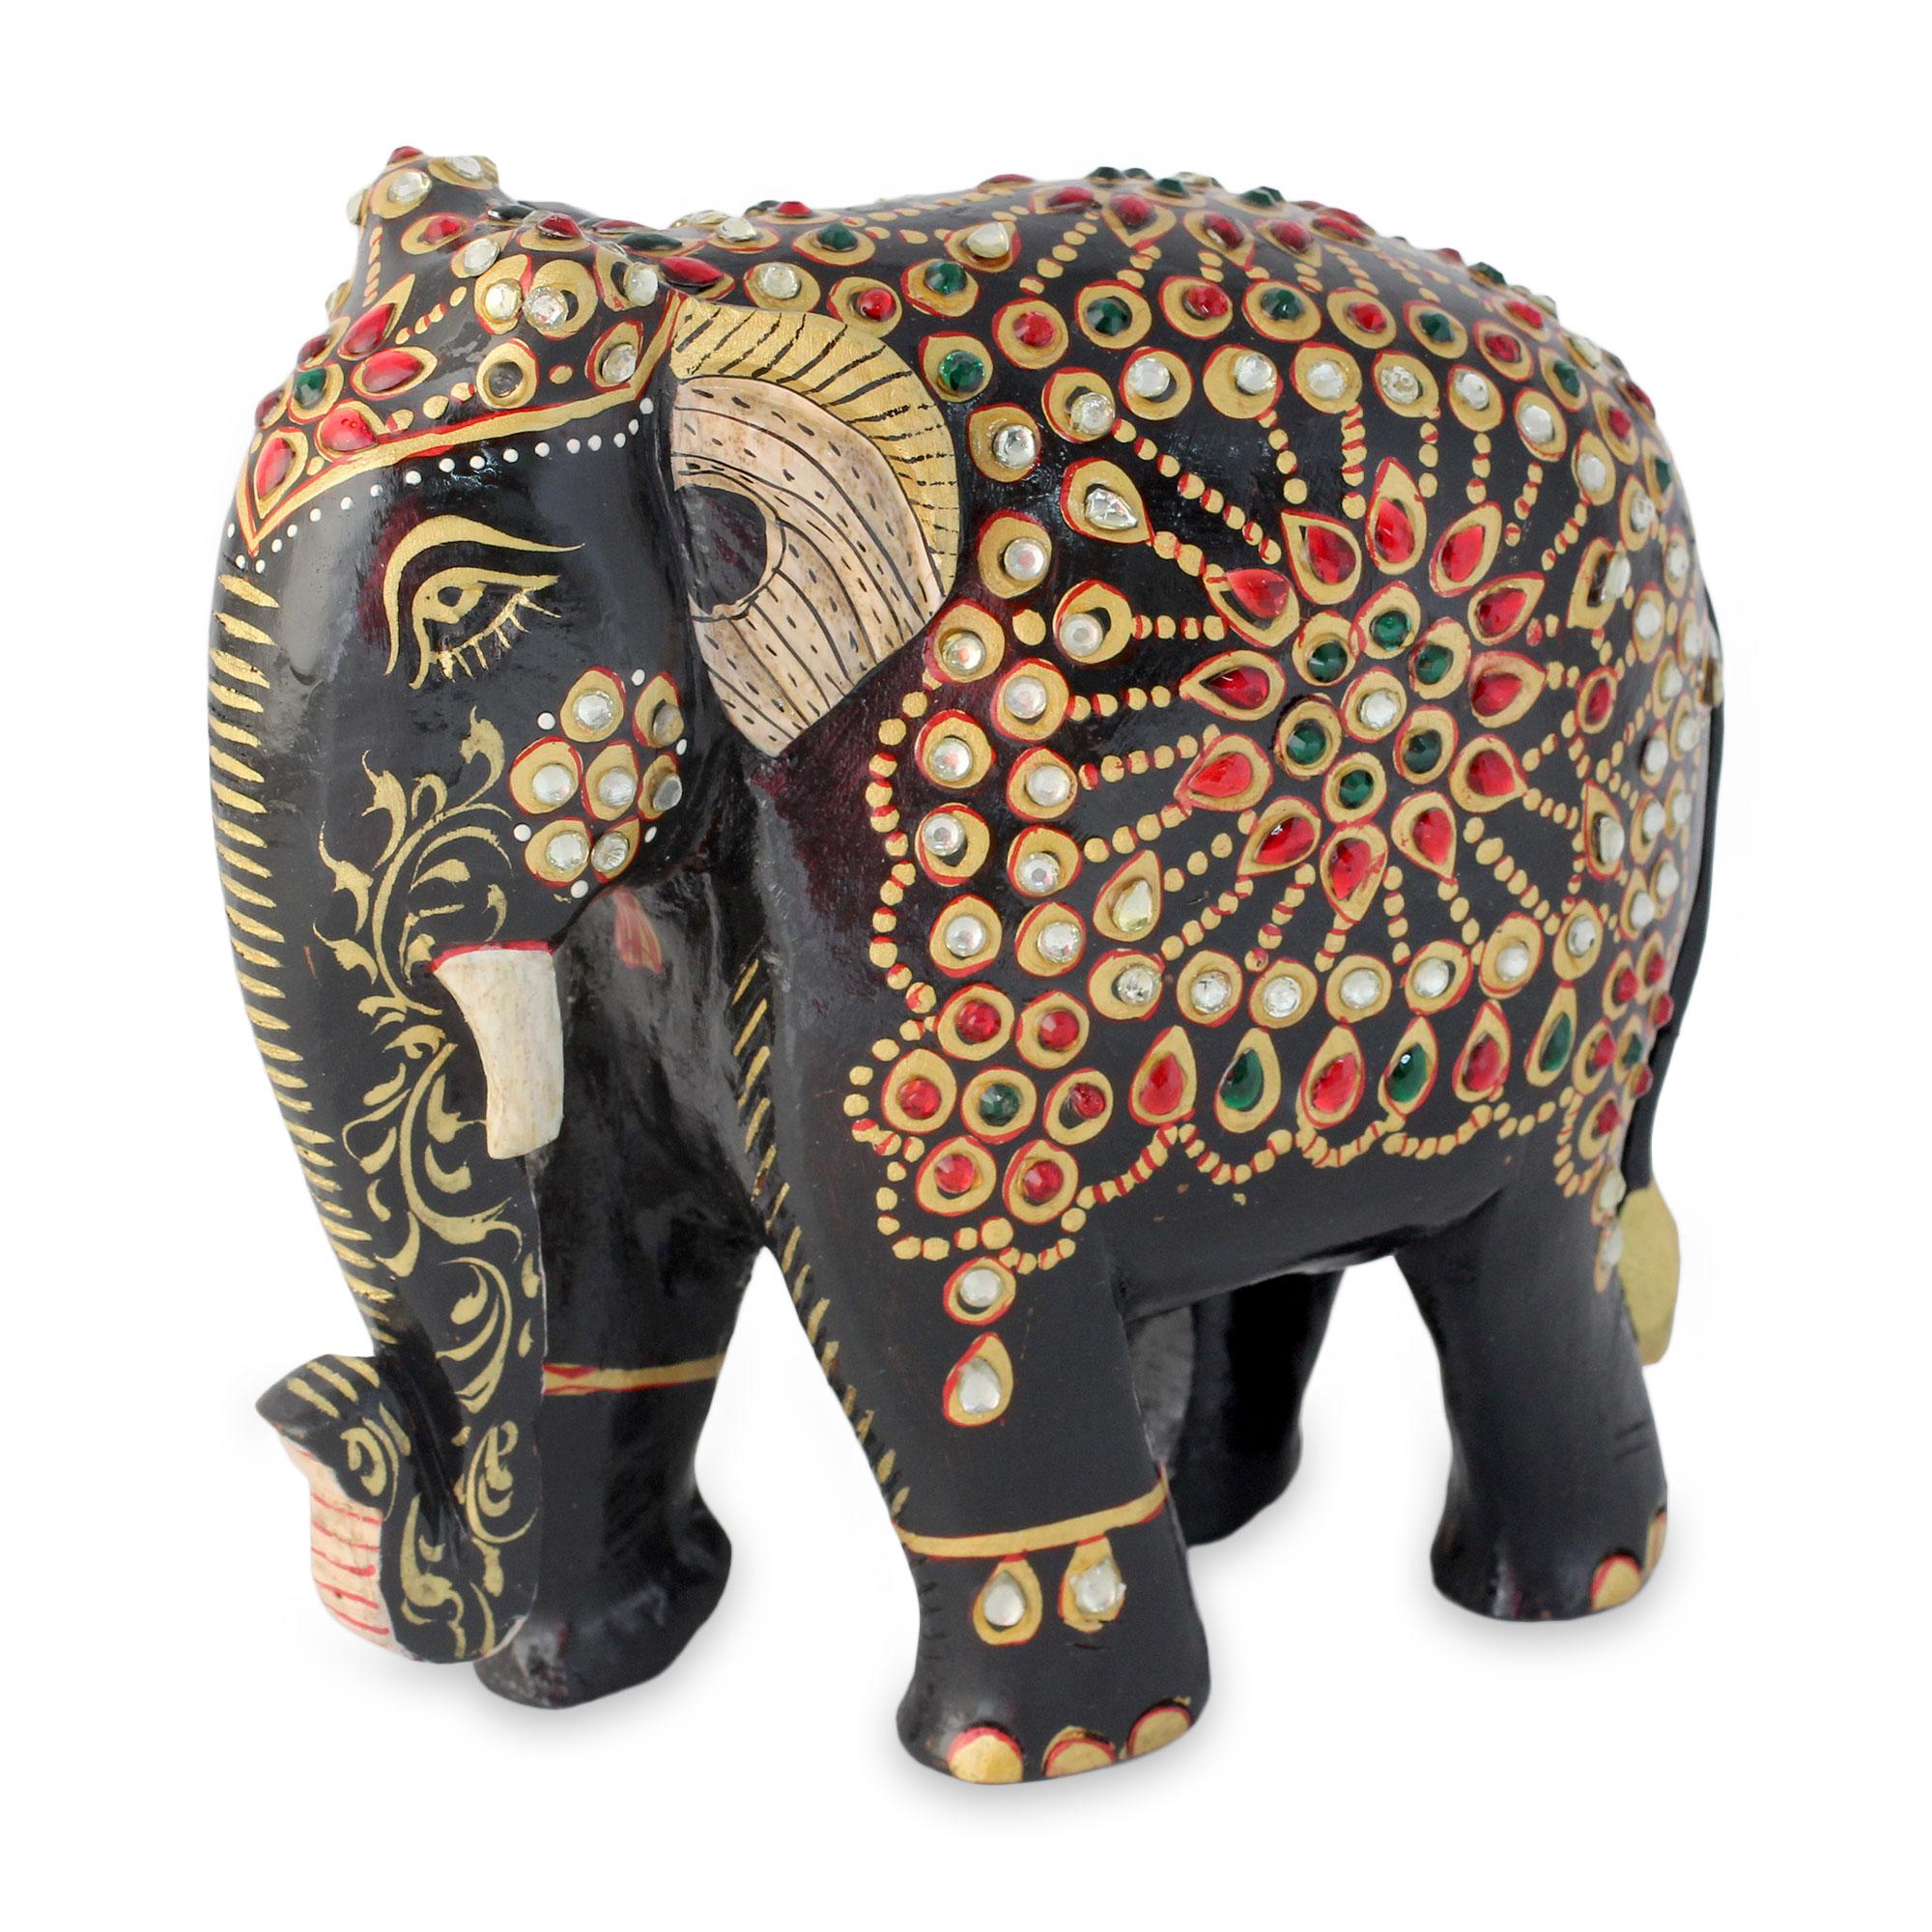 Unicef Uk Market Bejeweled Black Elephant Hand Crafted Sculpture From India Majestic Indian Elephant